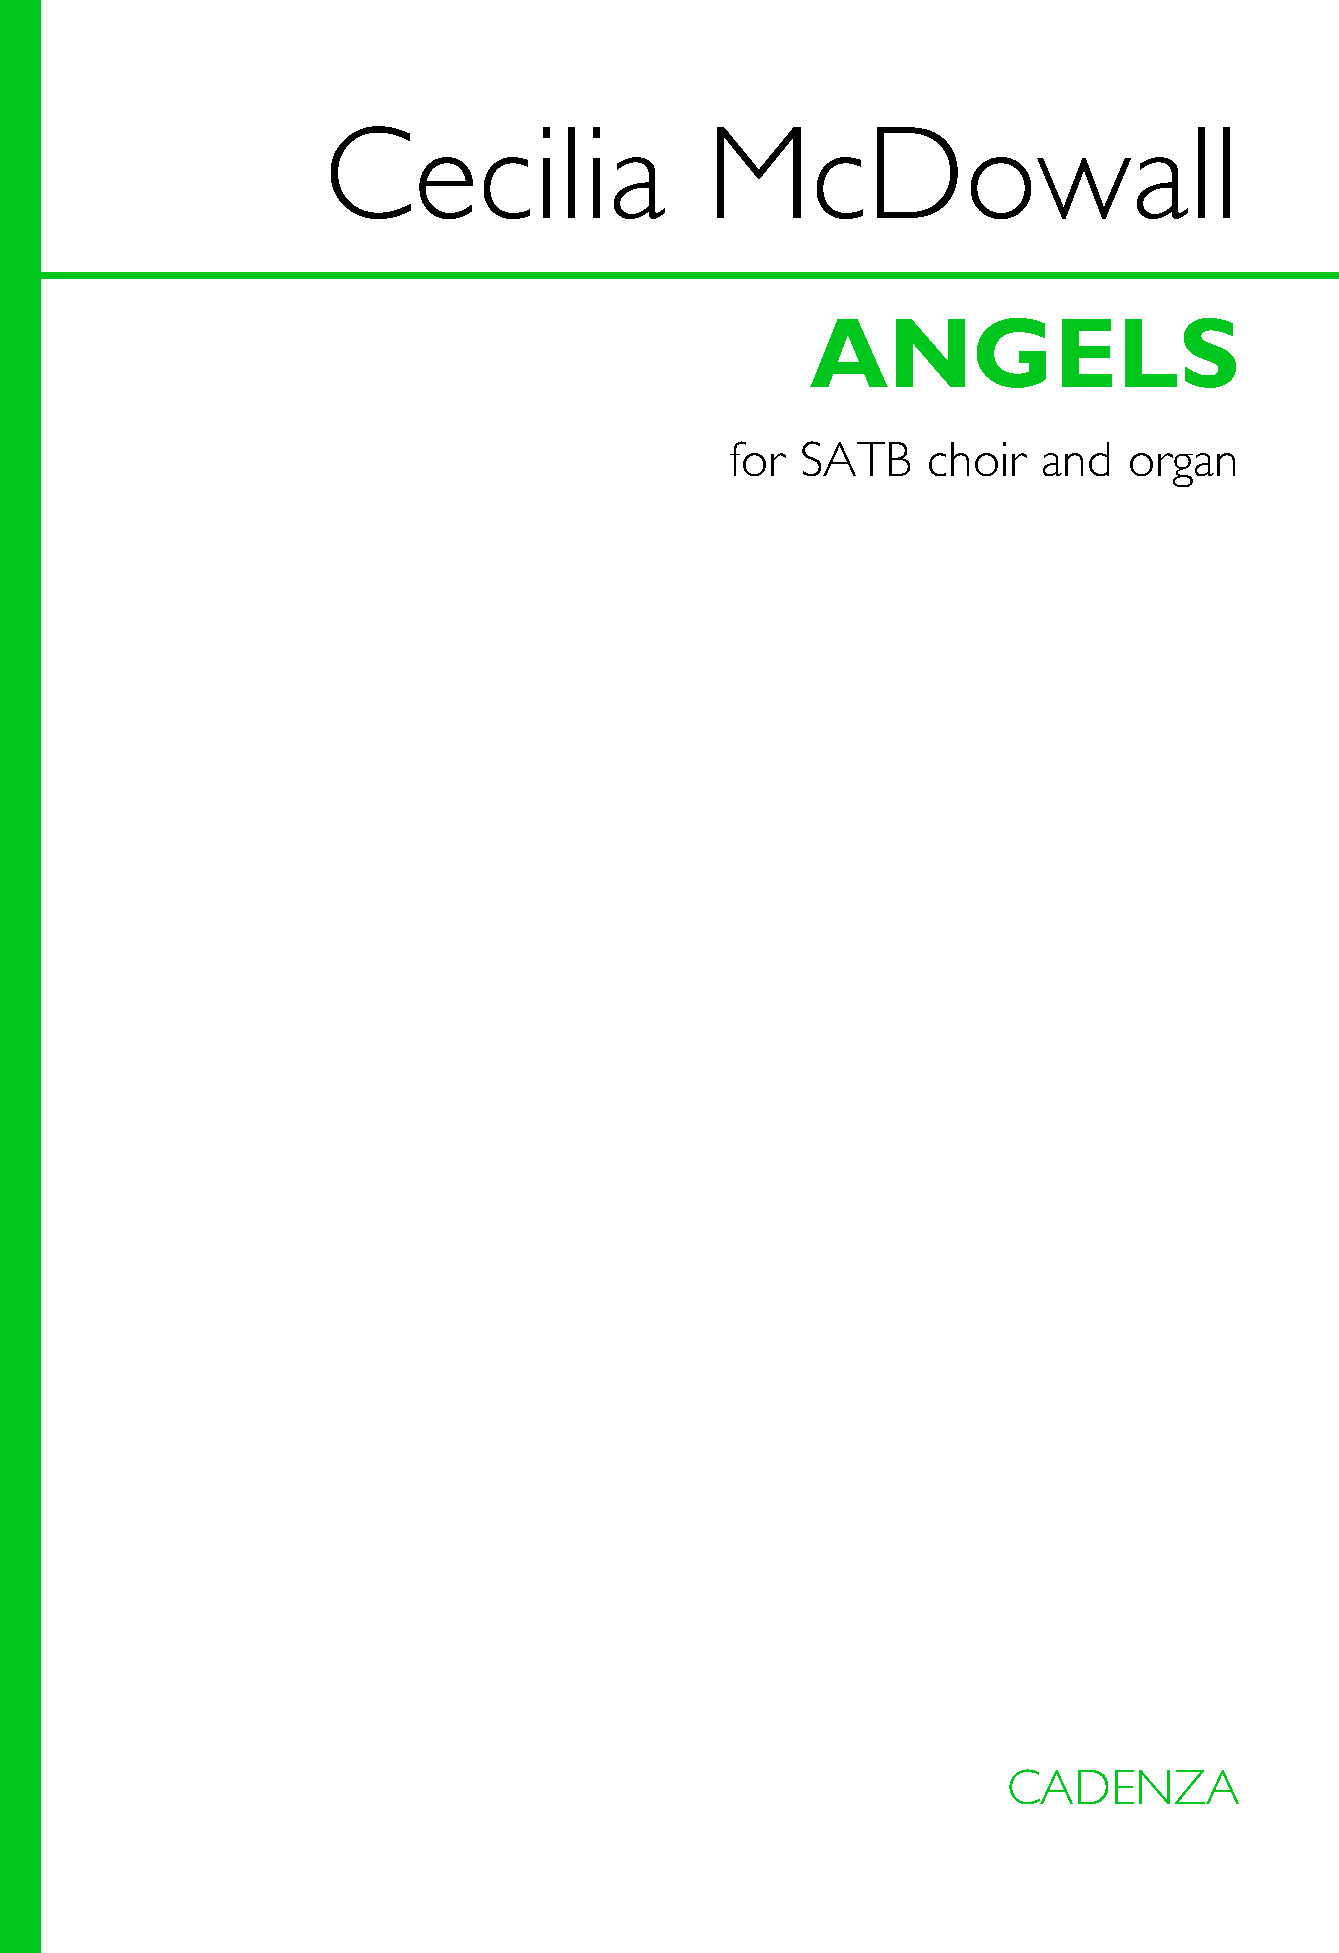 Cecilia McDowall: Angels